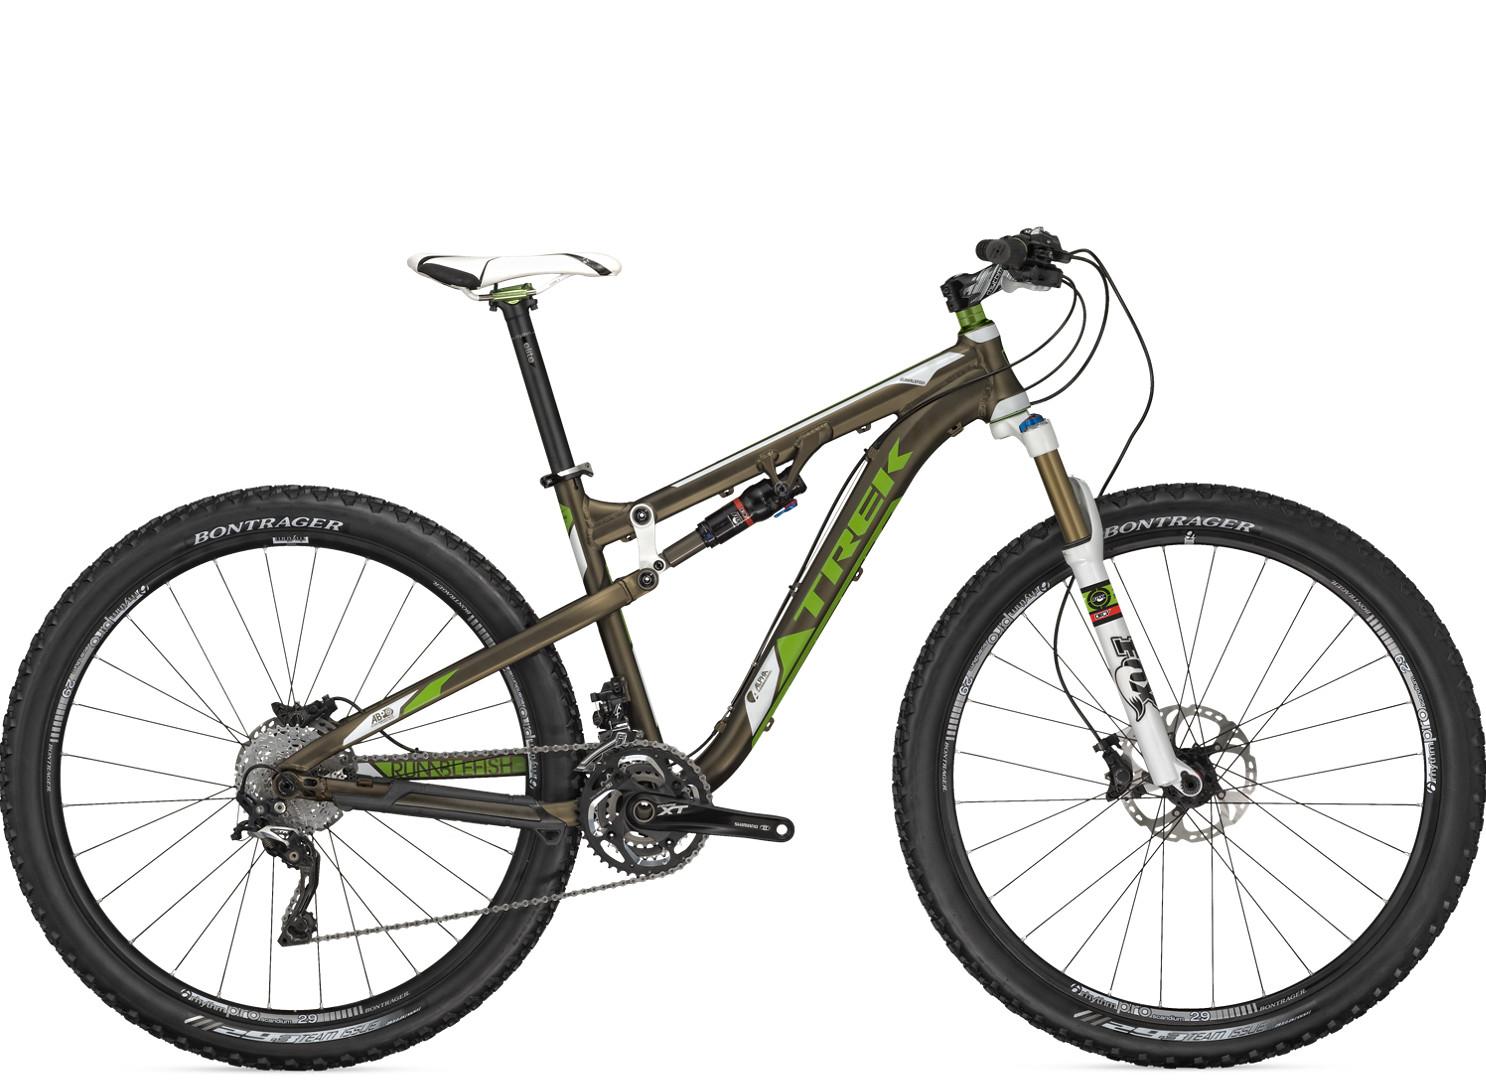 2012 Trek Rumblefish Pro Bike 23372